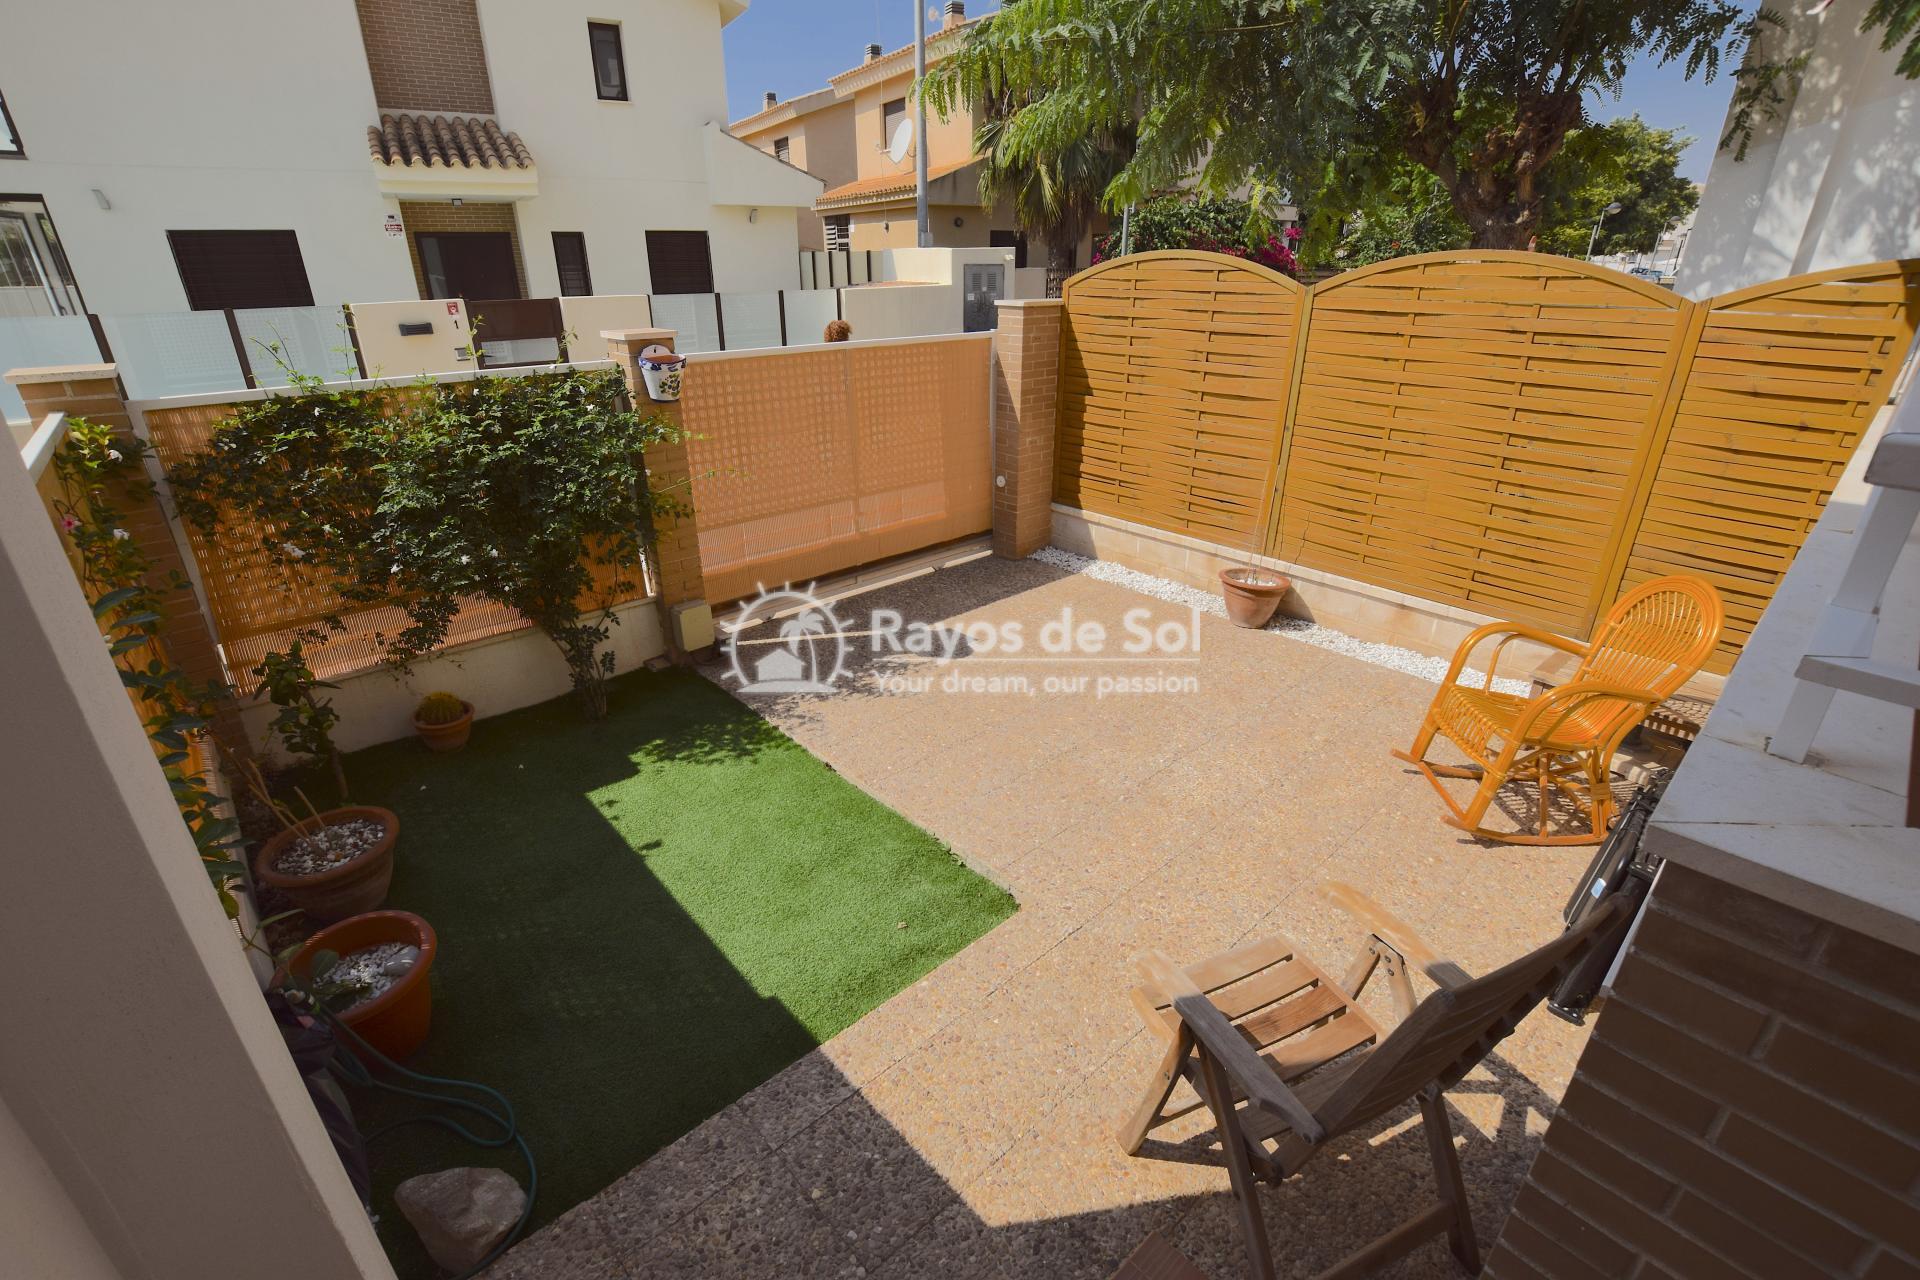 Appartement met zuidwest oriëntatie  in San Cayetano, Costa Cálida (SCRE0055) - 23